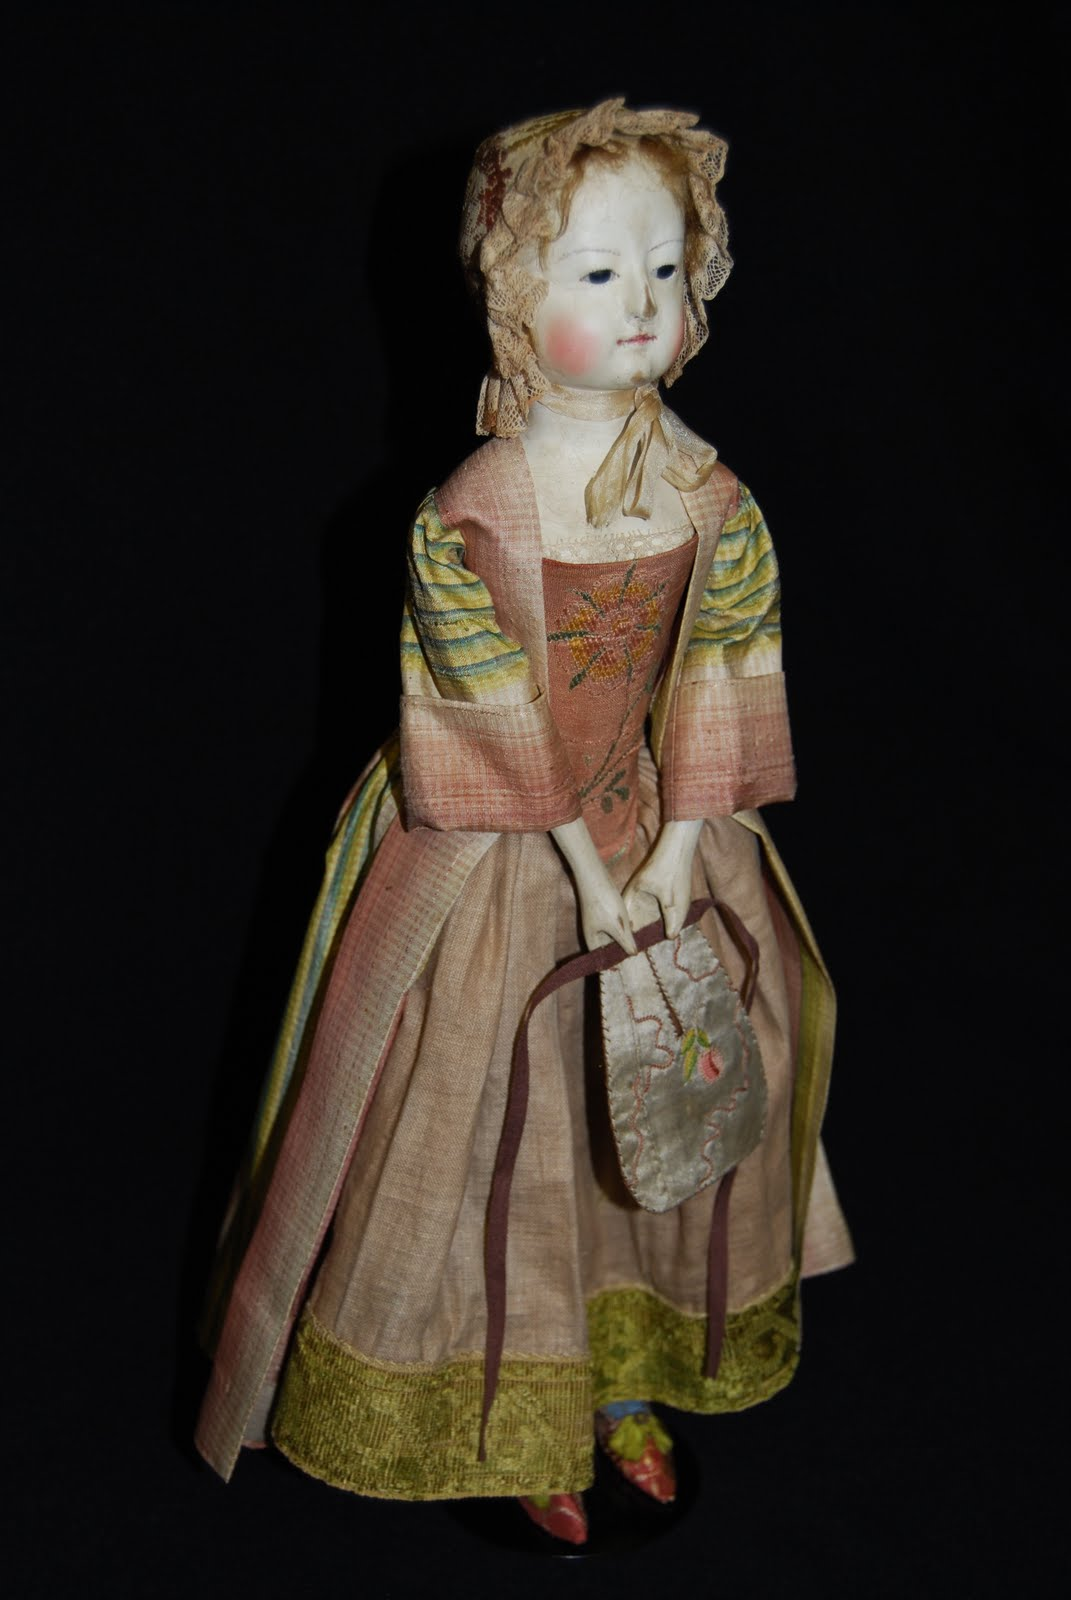 Glen Oaks Primitives Featured Doll Artist Kathy Patterson